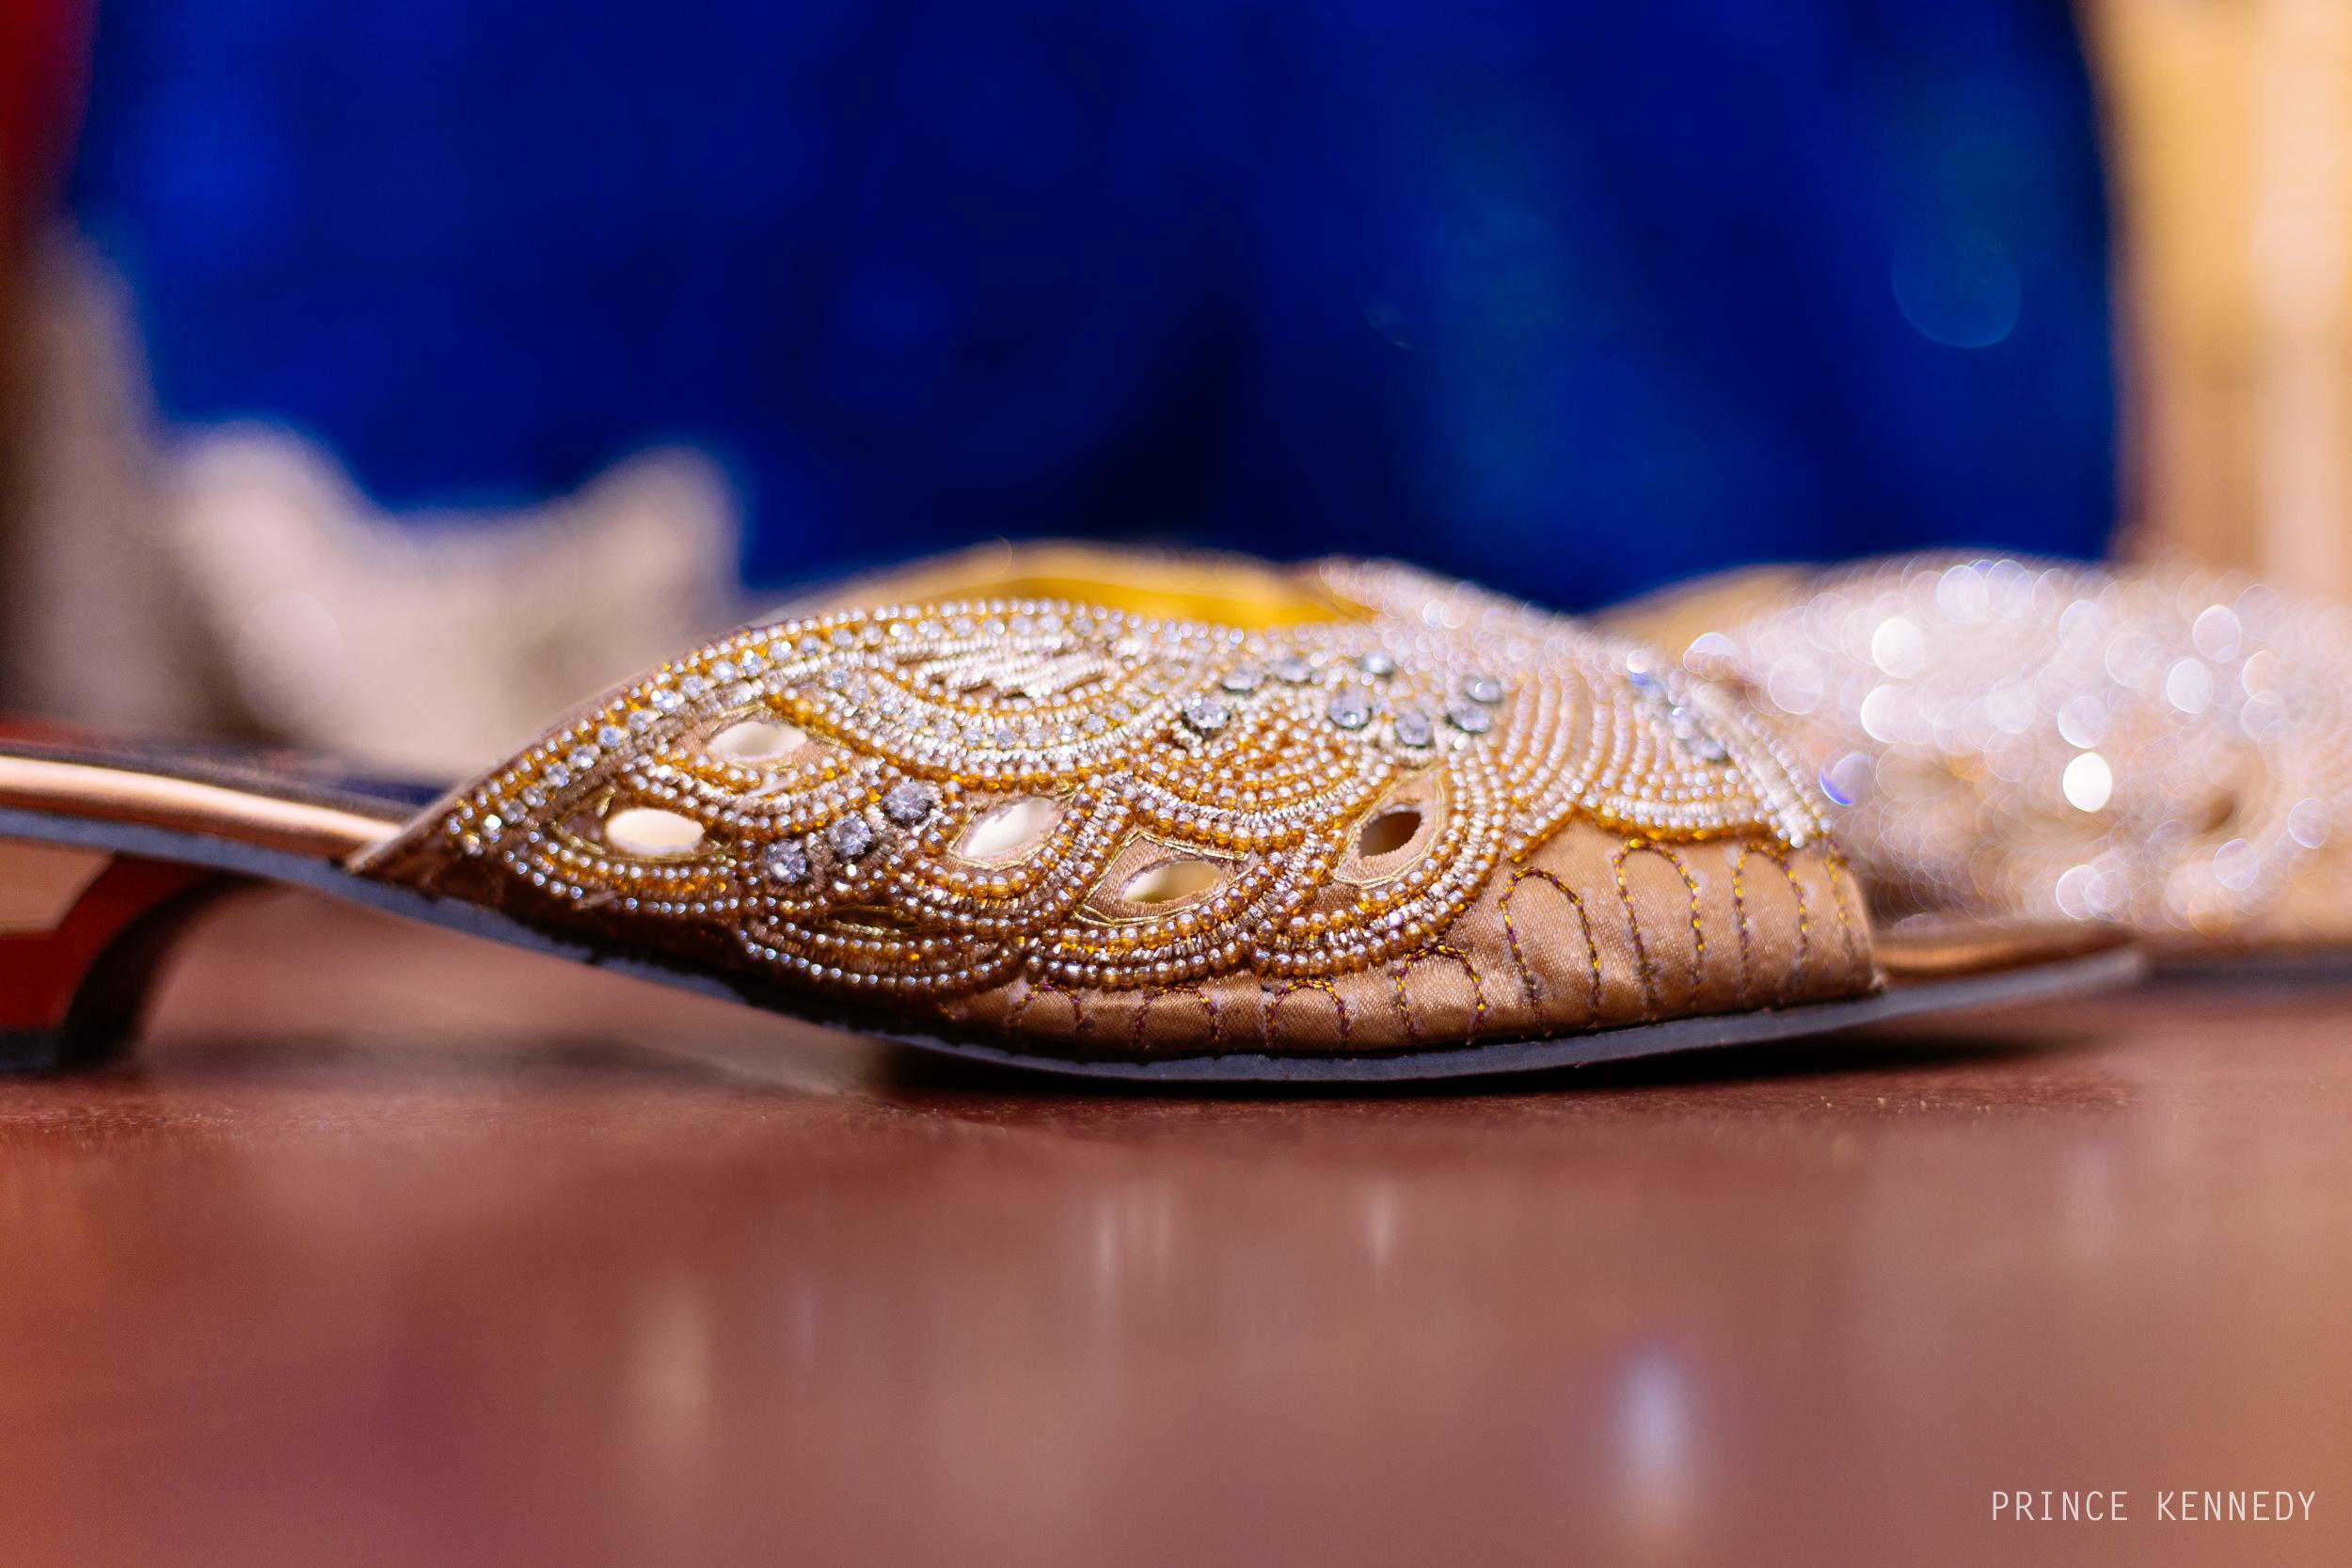 Athmajja-Nithesh-Engagement-Couple-Portrait-Portraiture-Wedding-Couple-Portrait-Chennai-Photographer-Candid-Photography-Destination-Best-Prince-Kennedy-Photography-6.jpg